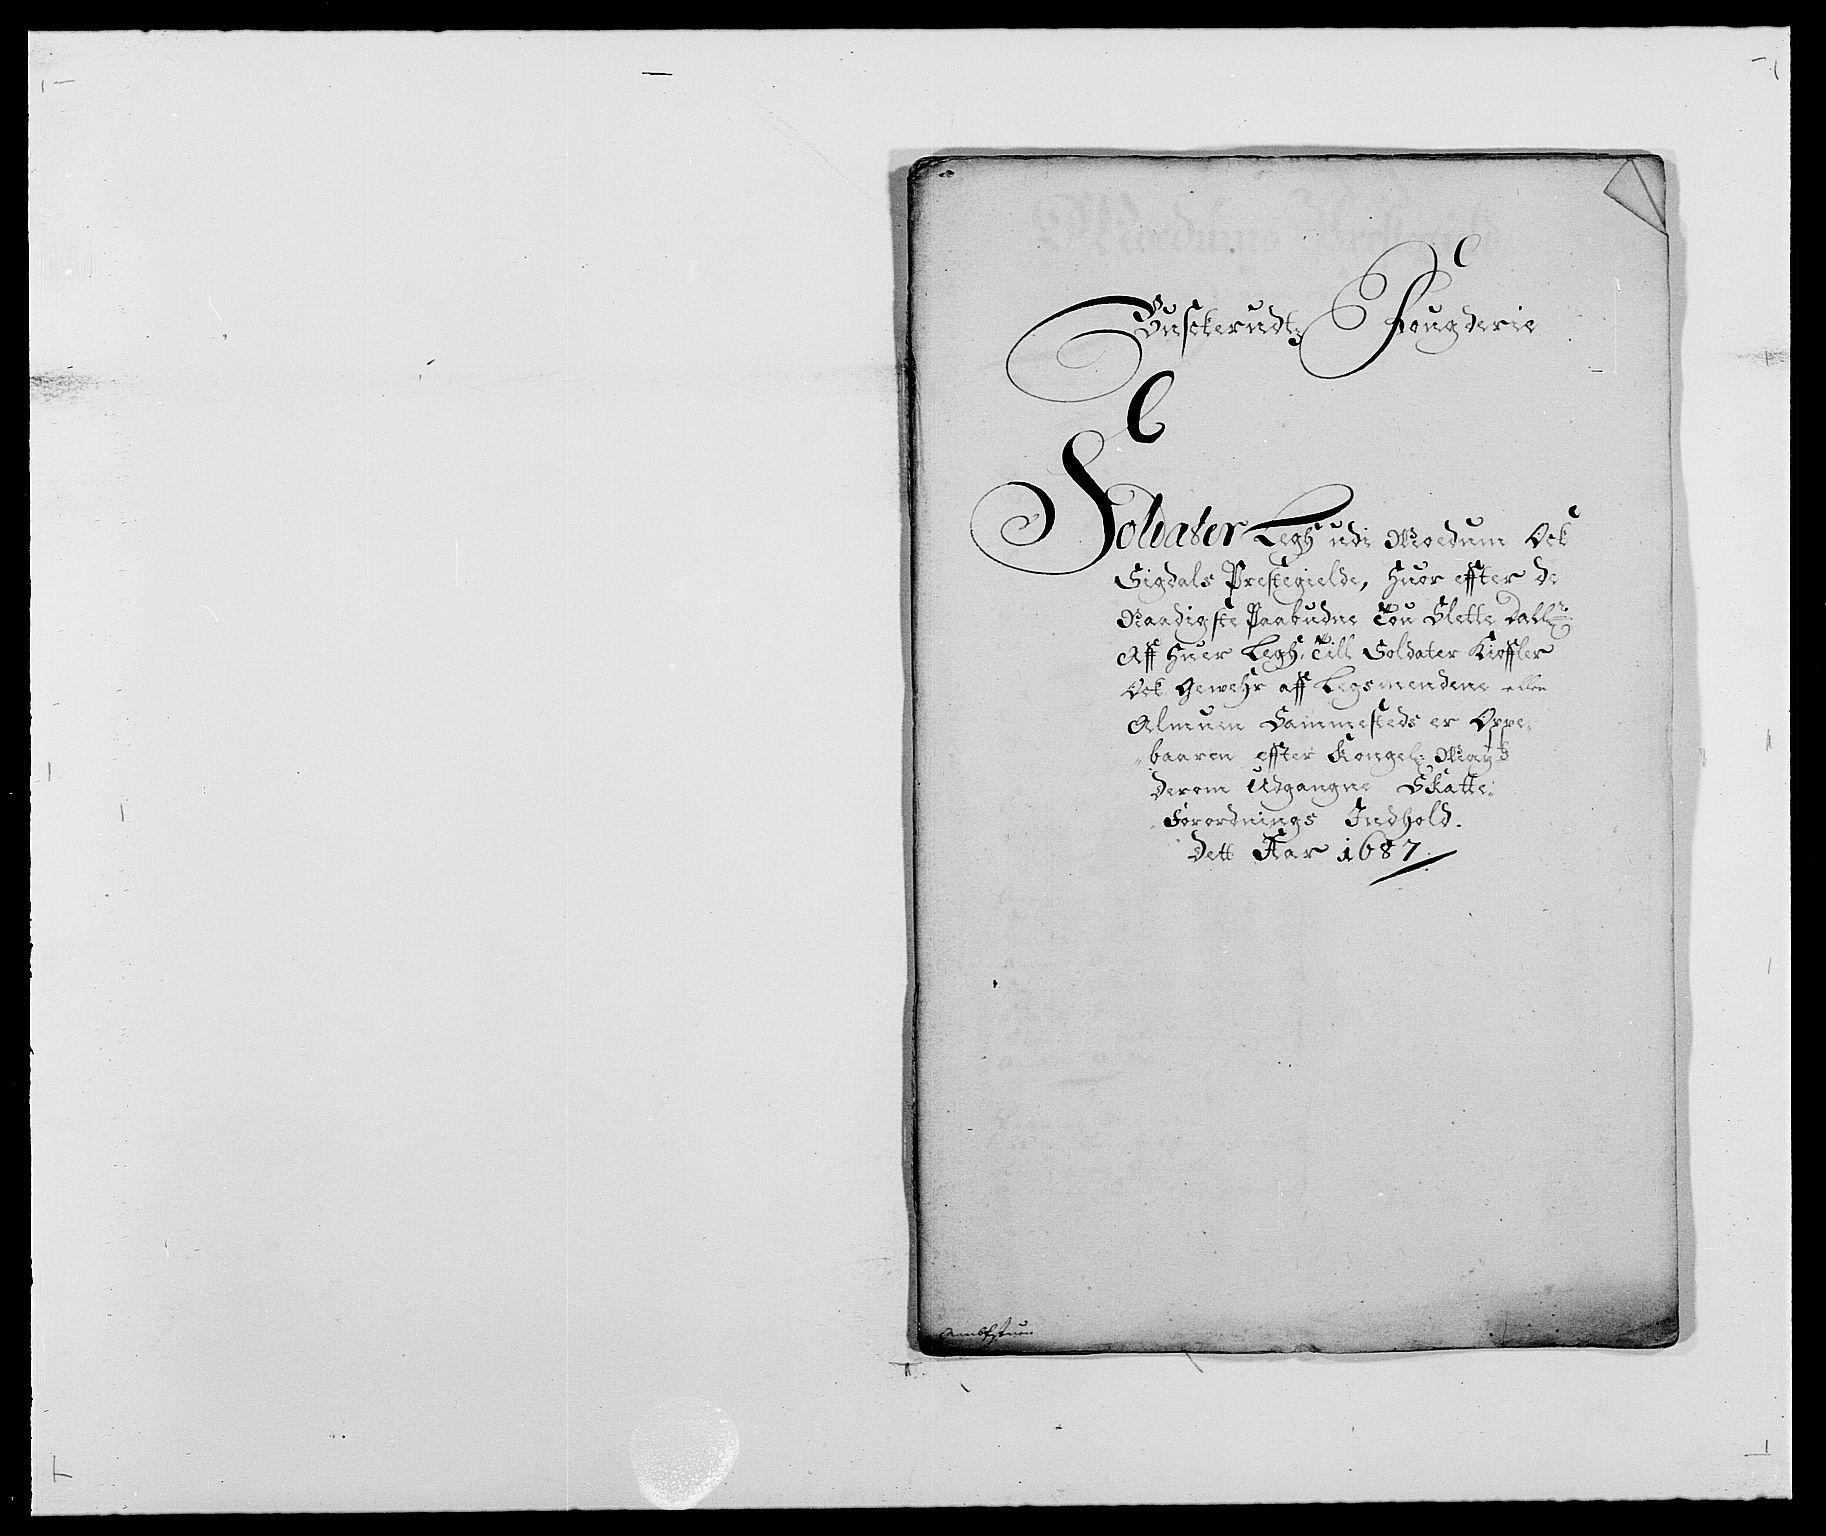 RA, Rentekammeret inntil 1814, Reviderte regnskaper, Fogderegnskap, R25/L1679: Fogderegnskap Buskerud, 1687-1688, s. 186